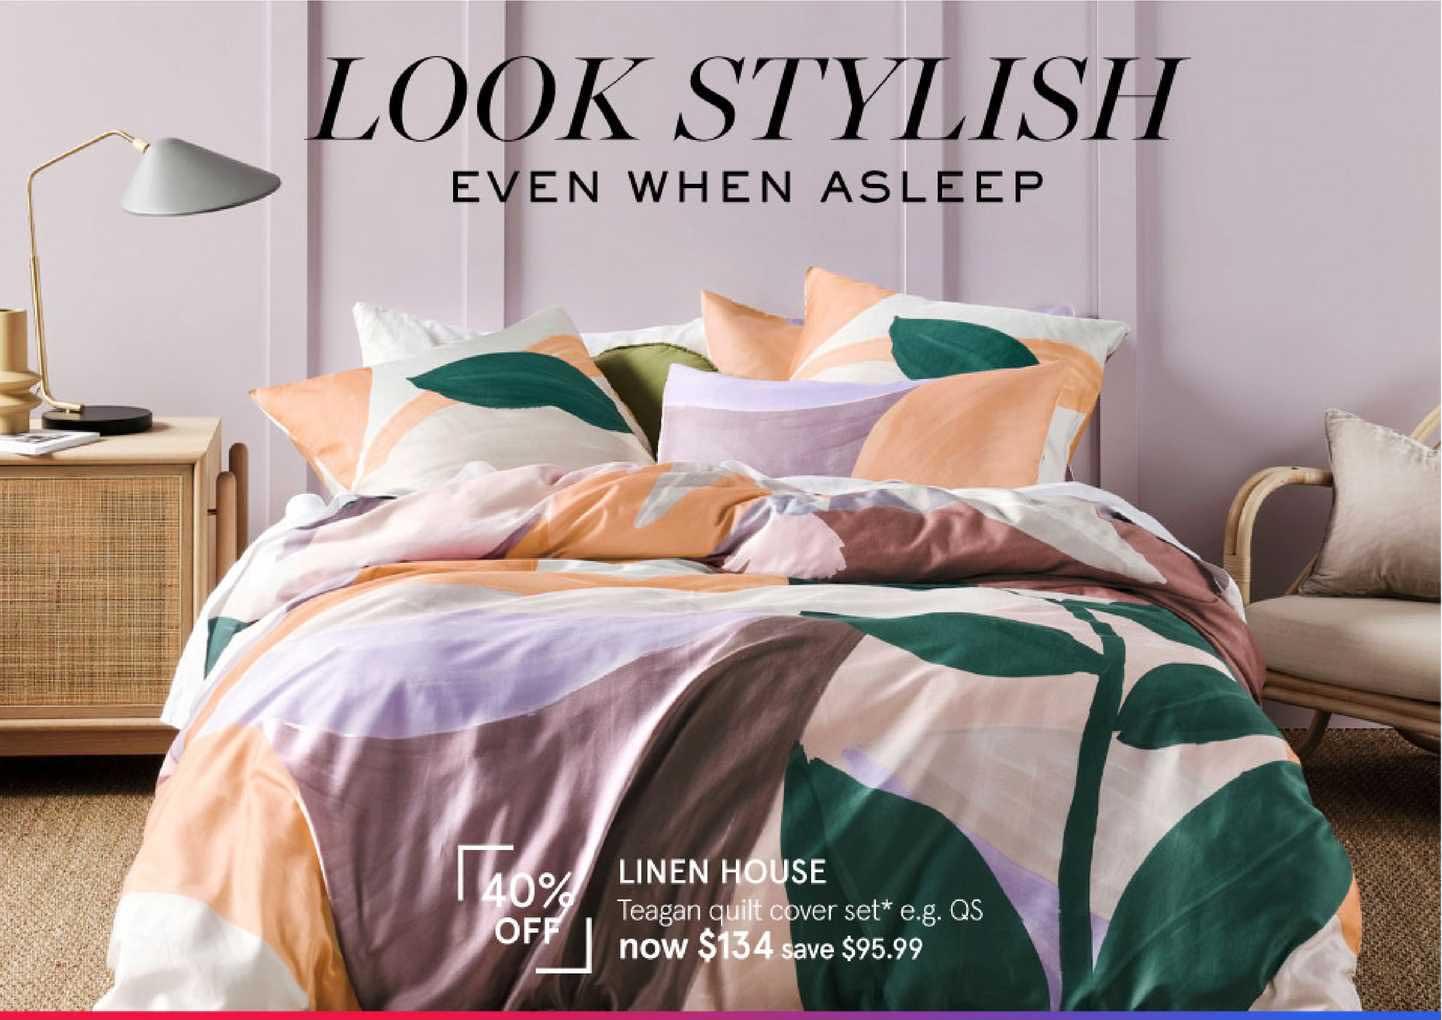 Myer Linen House Teagen Quilt Cover Set